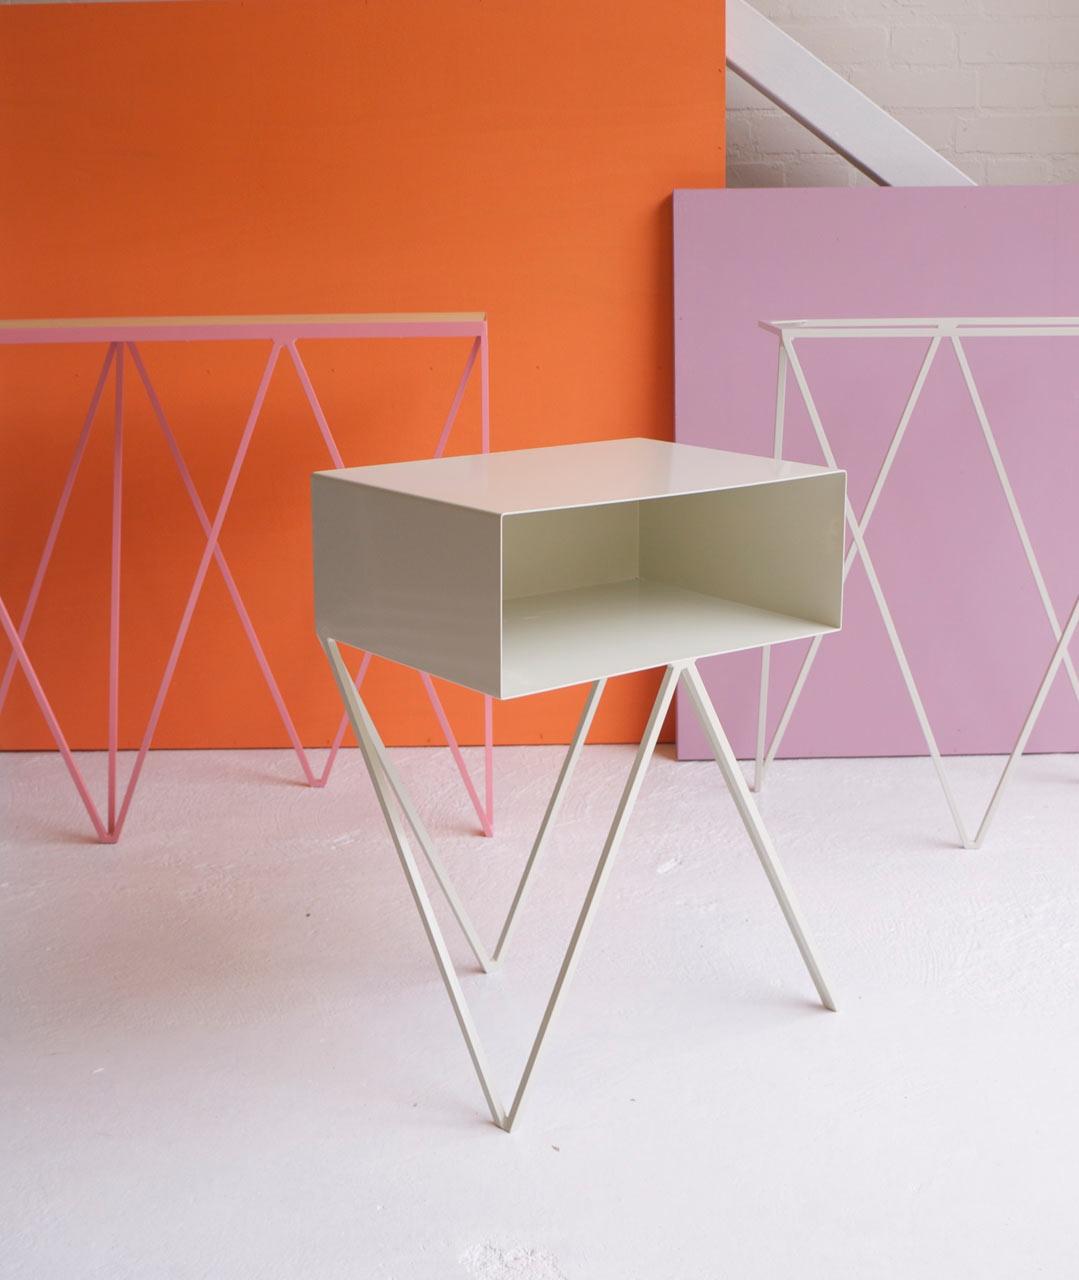 &New: Modern, Minimalist Furniture Made of Steel